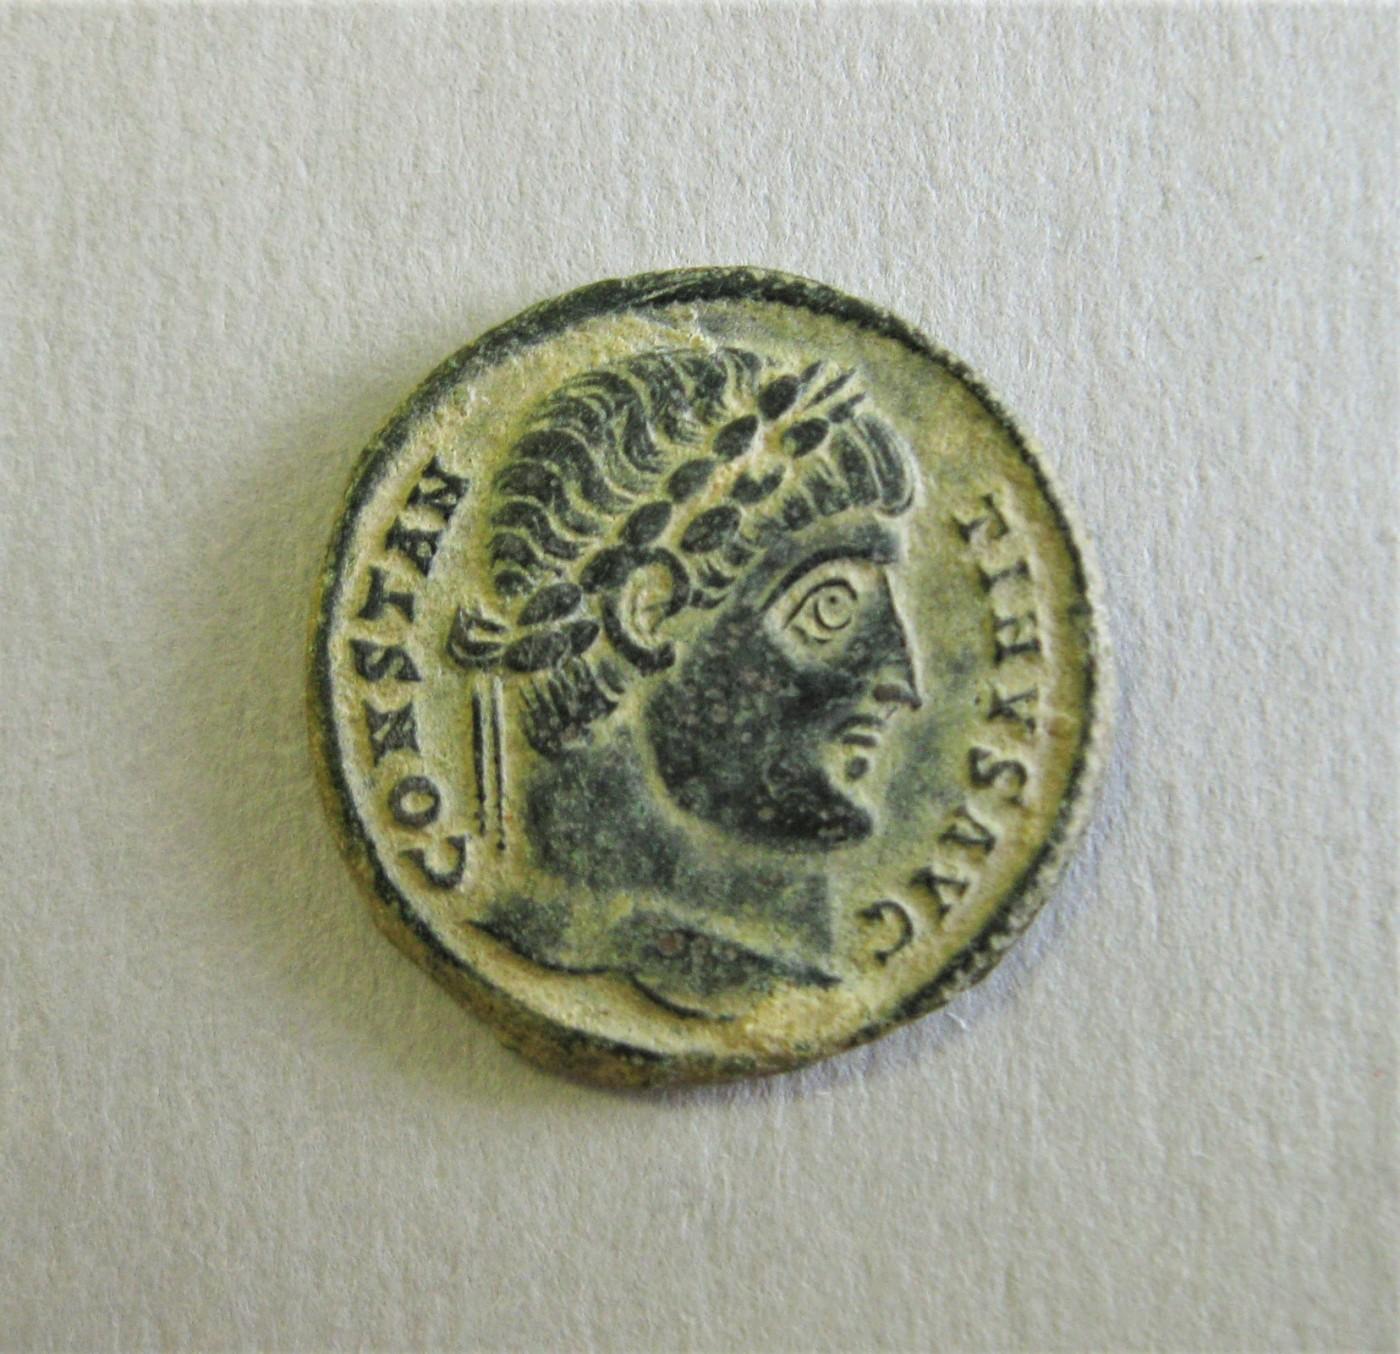 Constantine Coins, Roman coins, Roman antiquities, ancient coins, Roman Empire, Ancient Rome, Late Antiquity